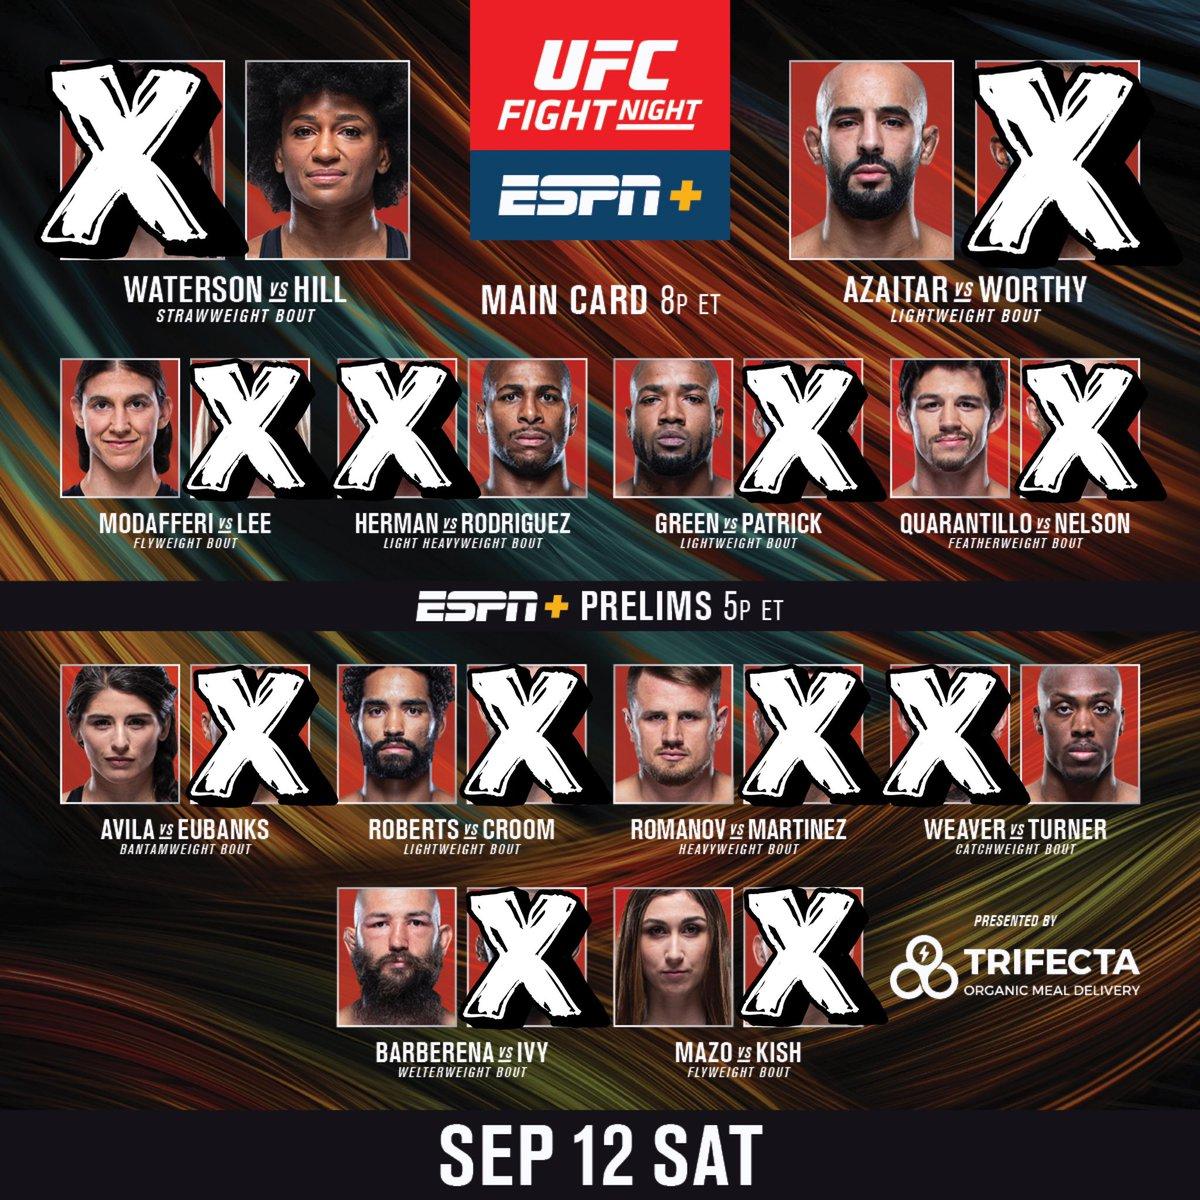 💰2020 #FightPick record:   • Overall: (182-117) | 60.87%  - Main Card: (78-66) | 54.17% - Prelims: (96-42) | 69.57% - Early Prelims: (8-9) | 47.06%   2️⃣ Draws:  • #UFCBrasilia  • #UFCVegas5  1️⃣ No Contest: #UFC247 https://t.co/5wukVEHpG8